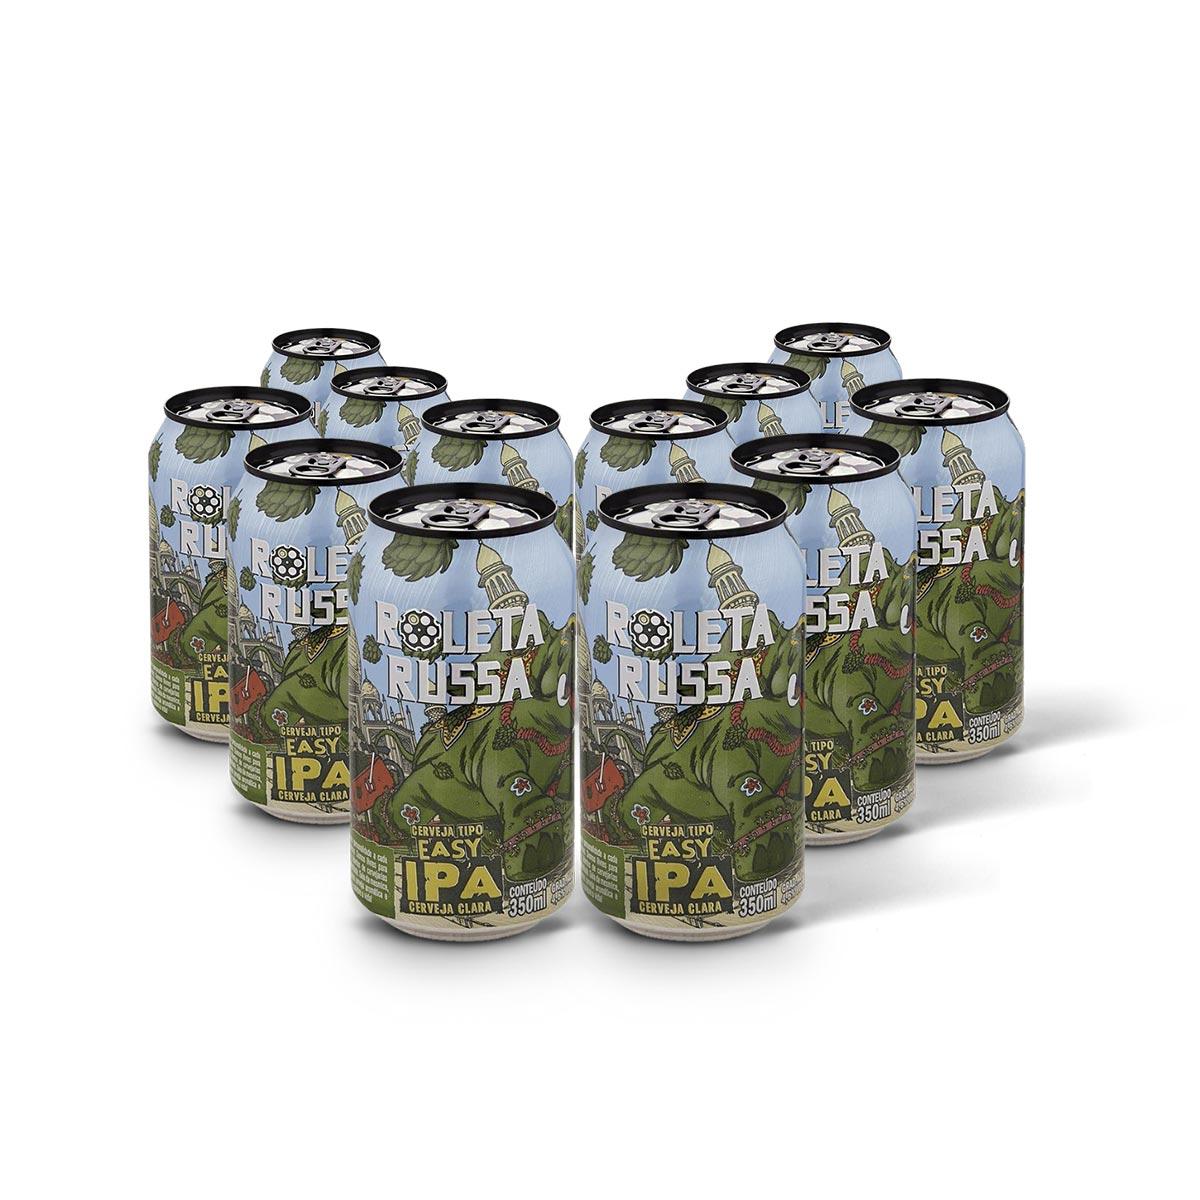 Pack Roleta Russa Easy IPA 12 cervejas 350ml  - RS BEER - Cervejas Gaúchas